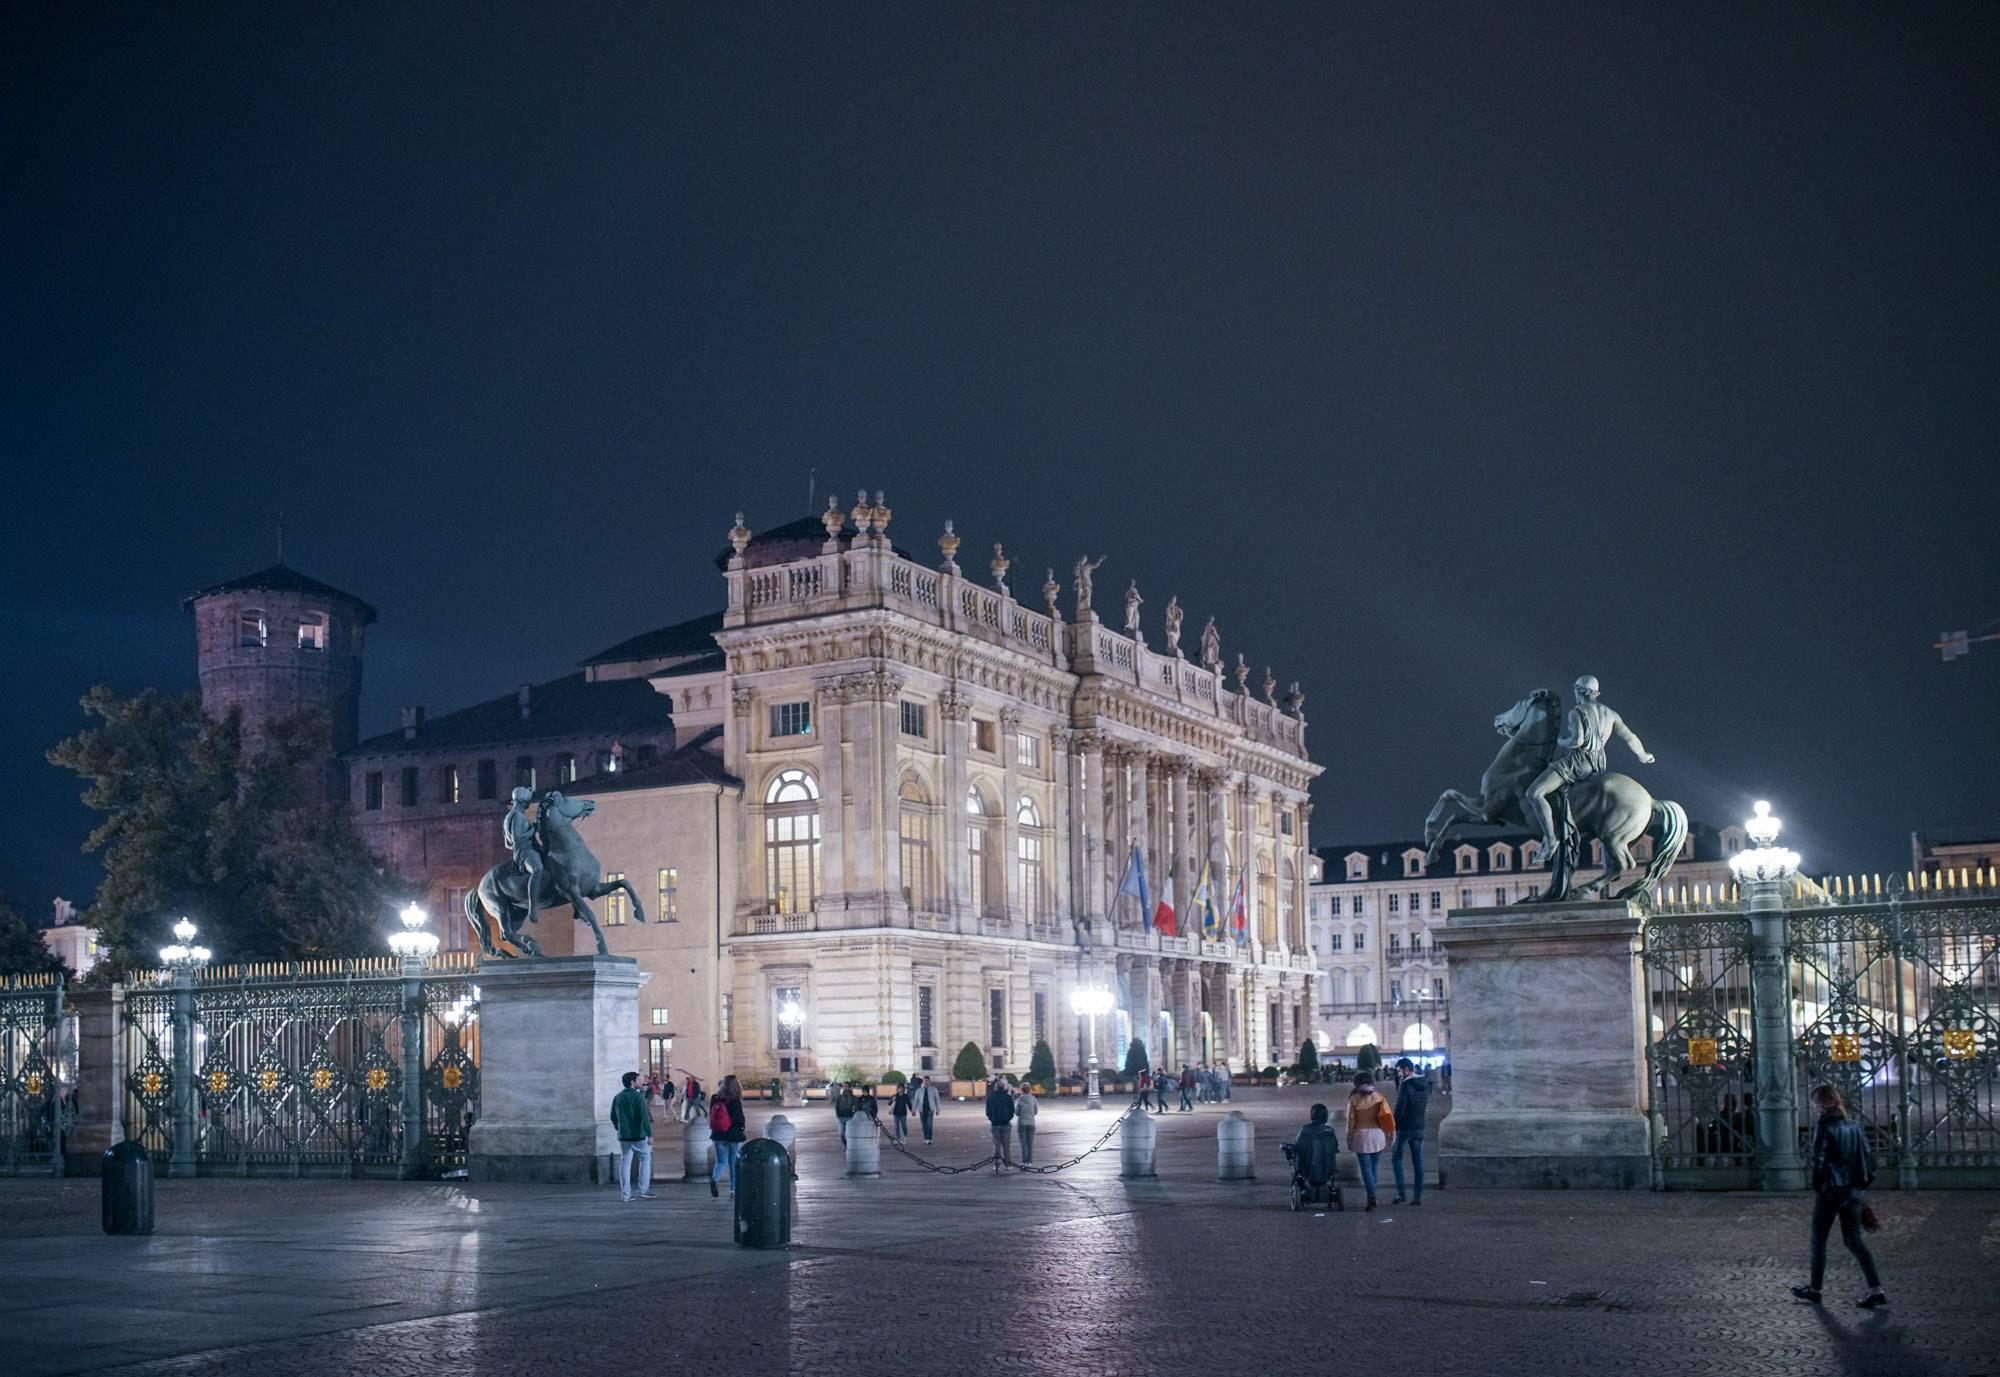 Turin by night.